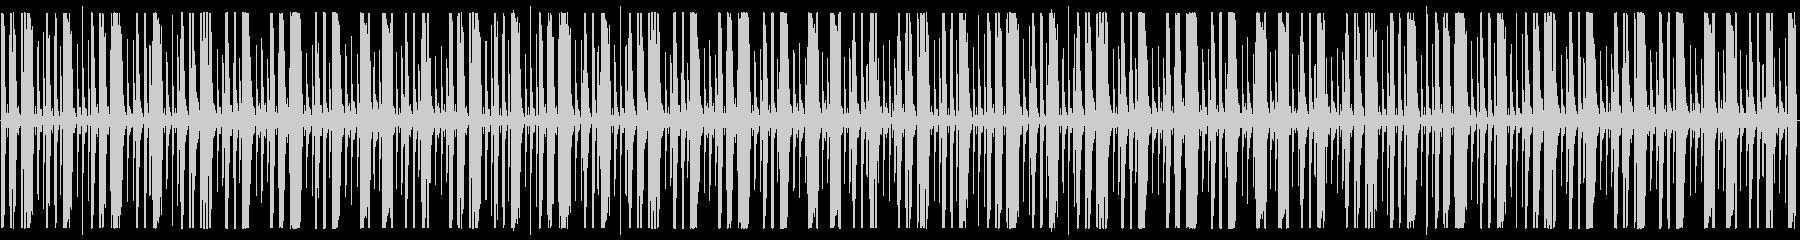 YouTube トロンボーン・コミカルの未再生の波形